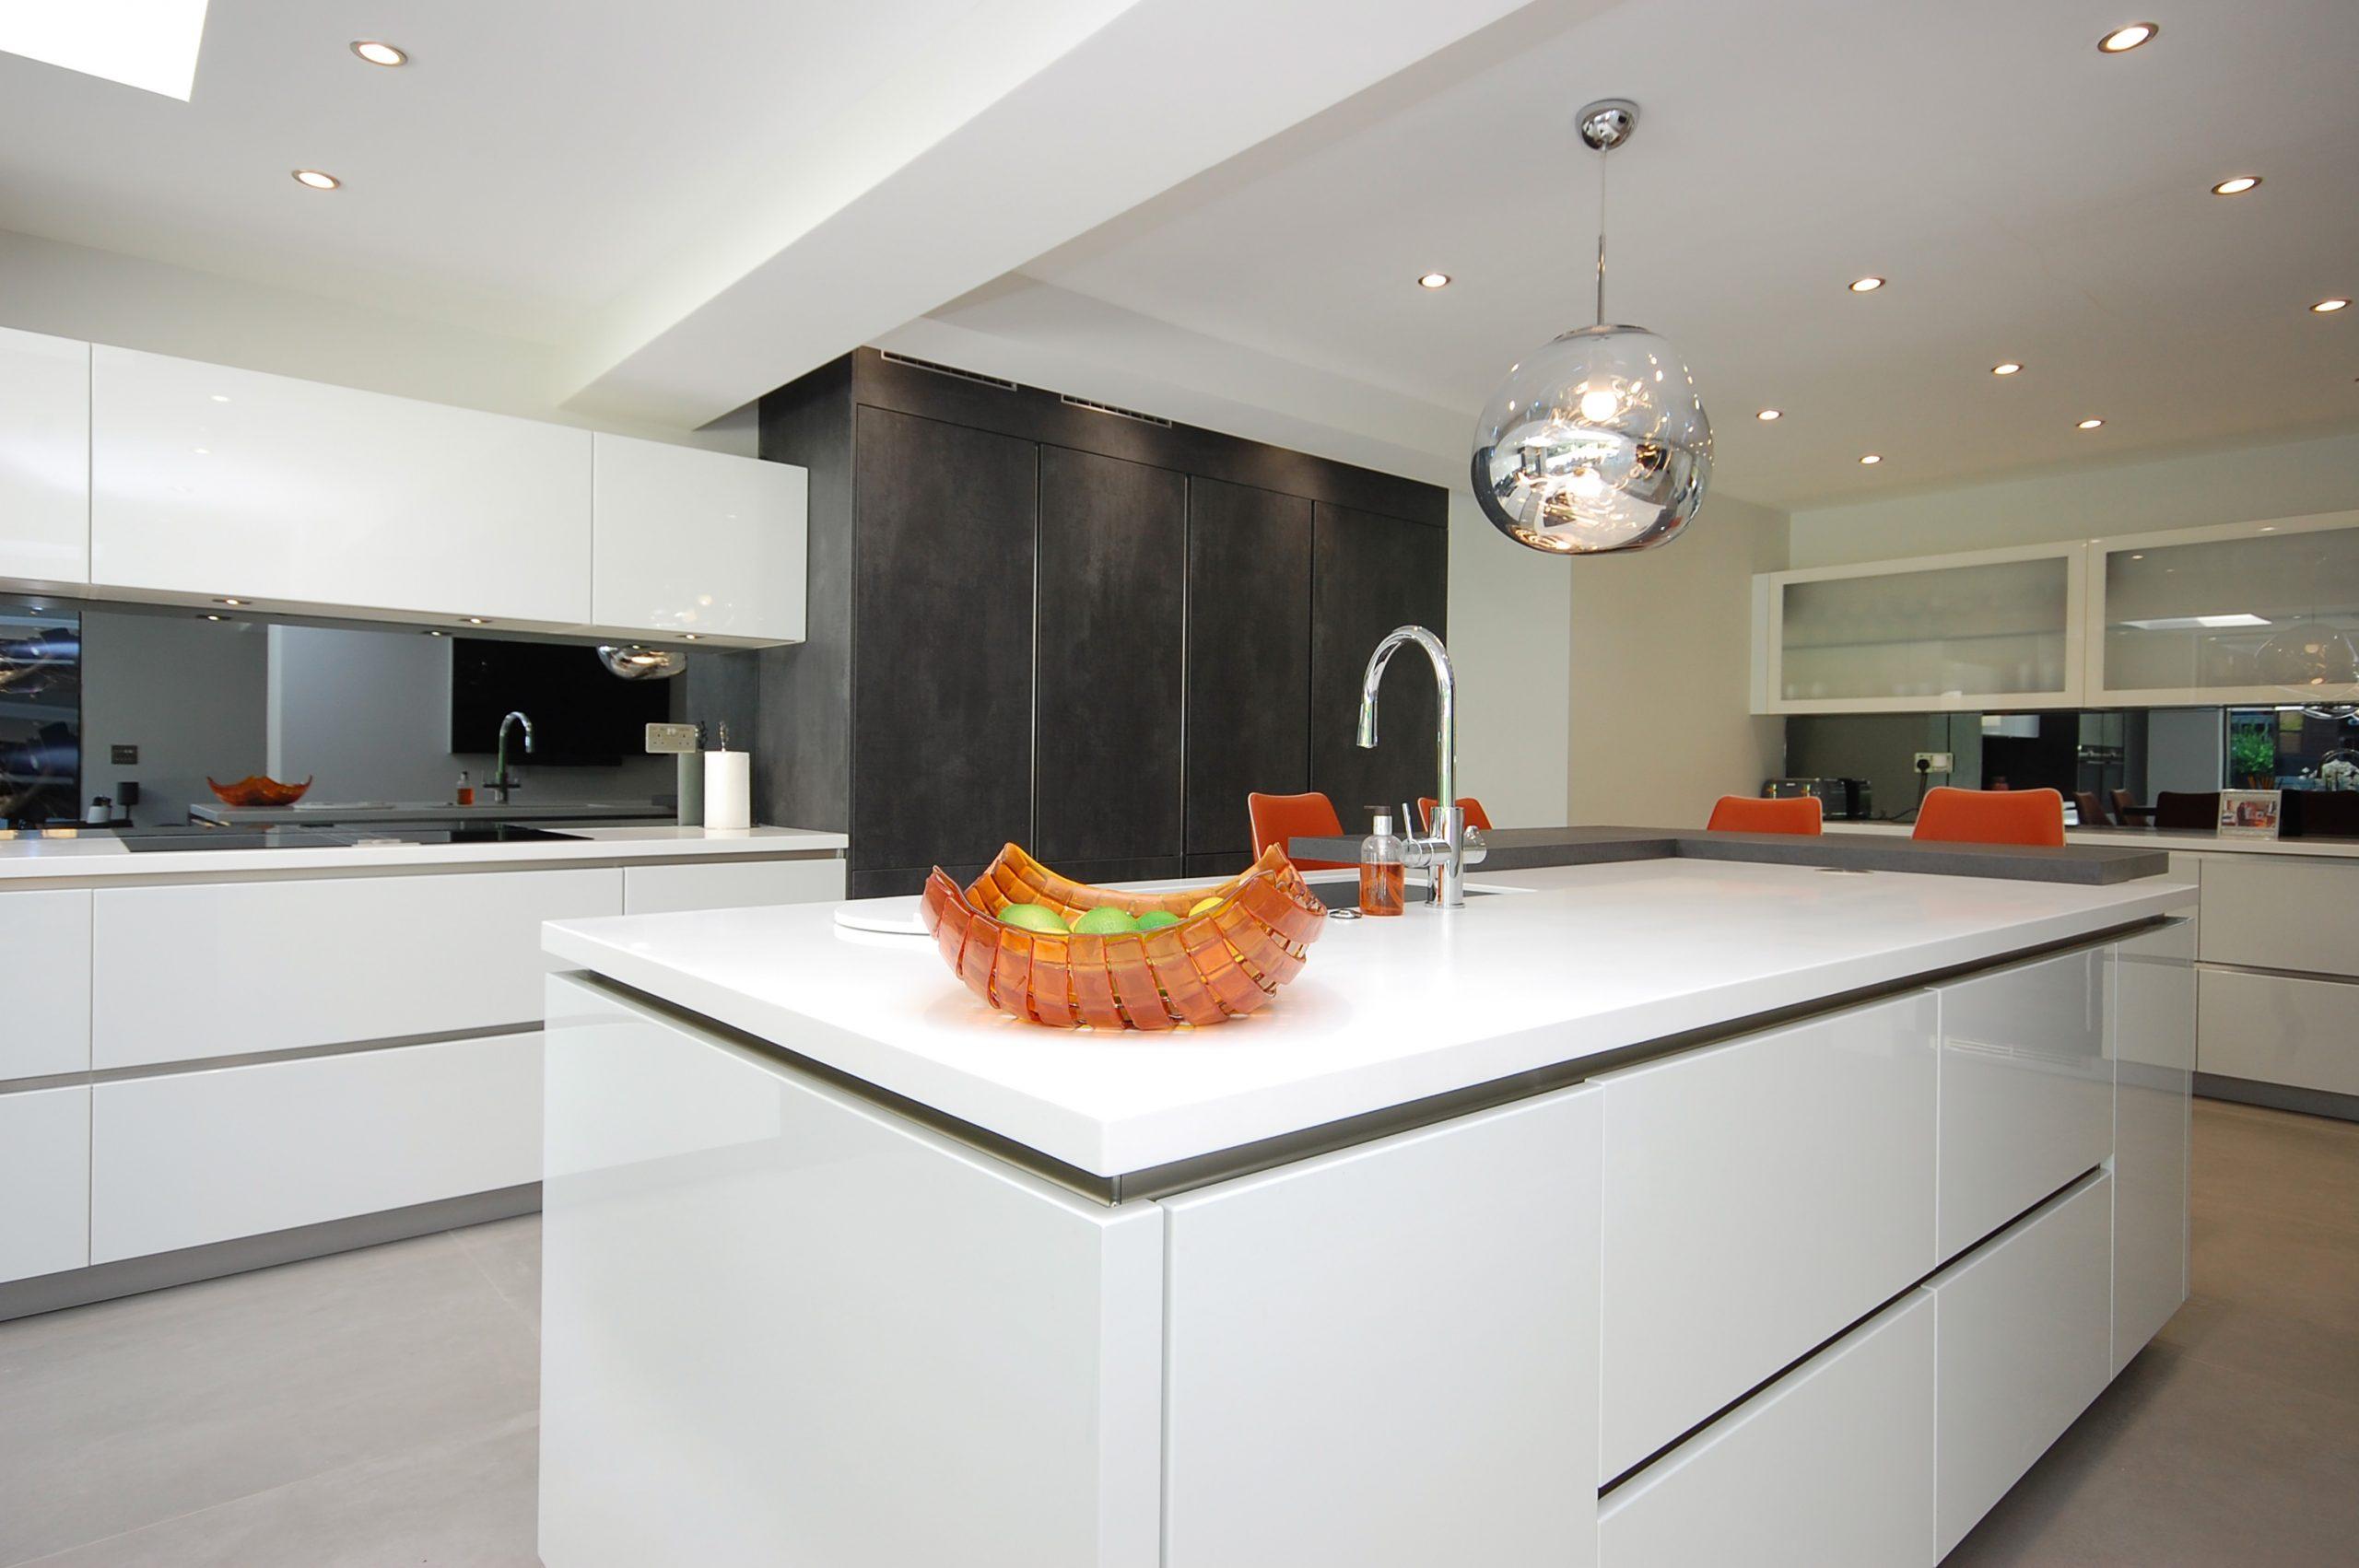 Chigwell Residential Refurb Extension Kitchen Island